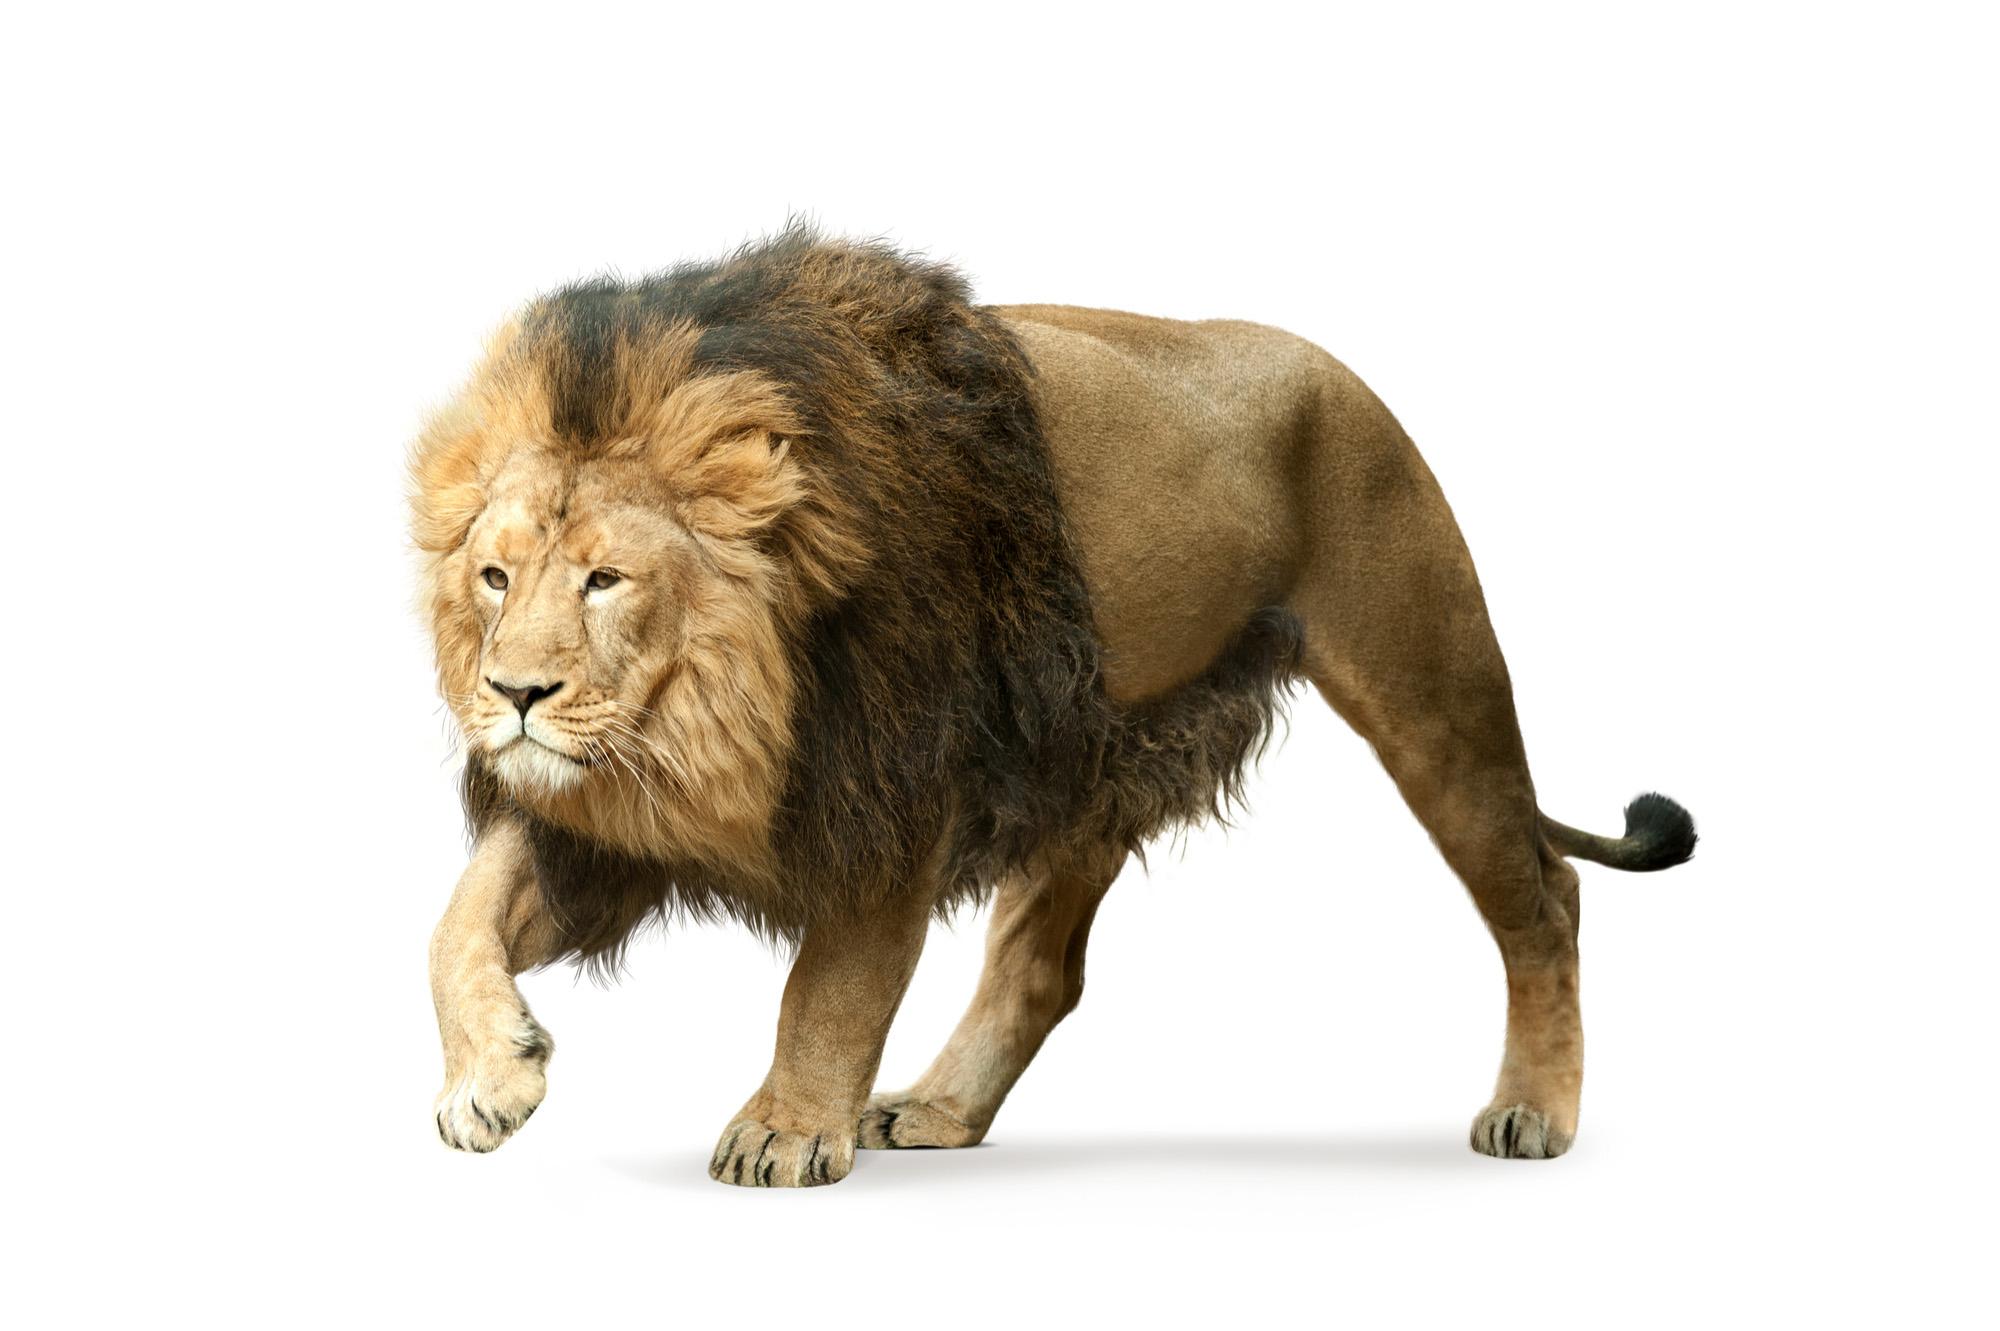 Lion-72 ppi